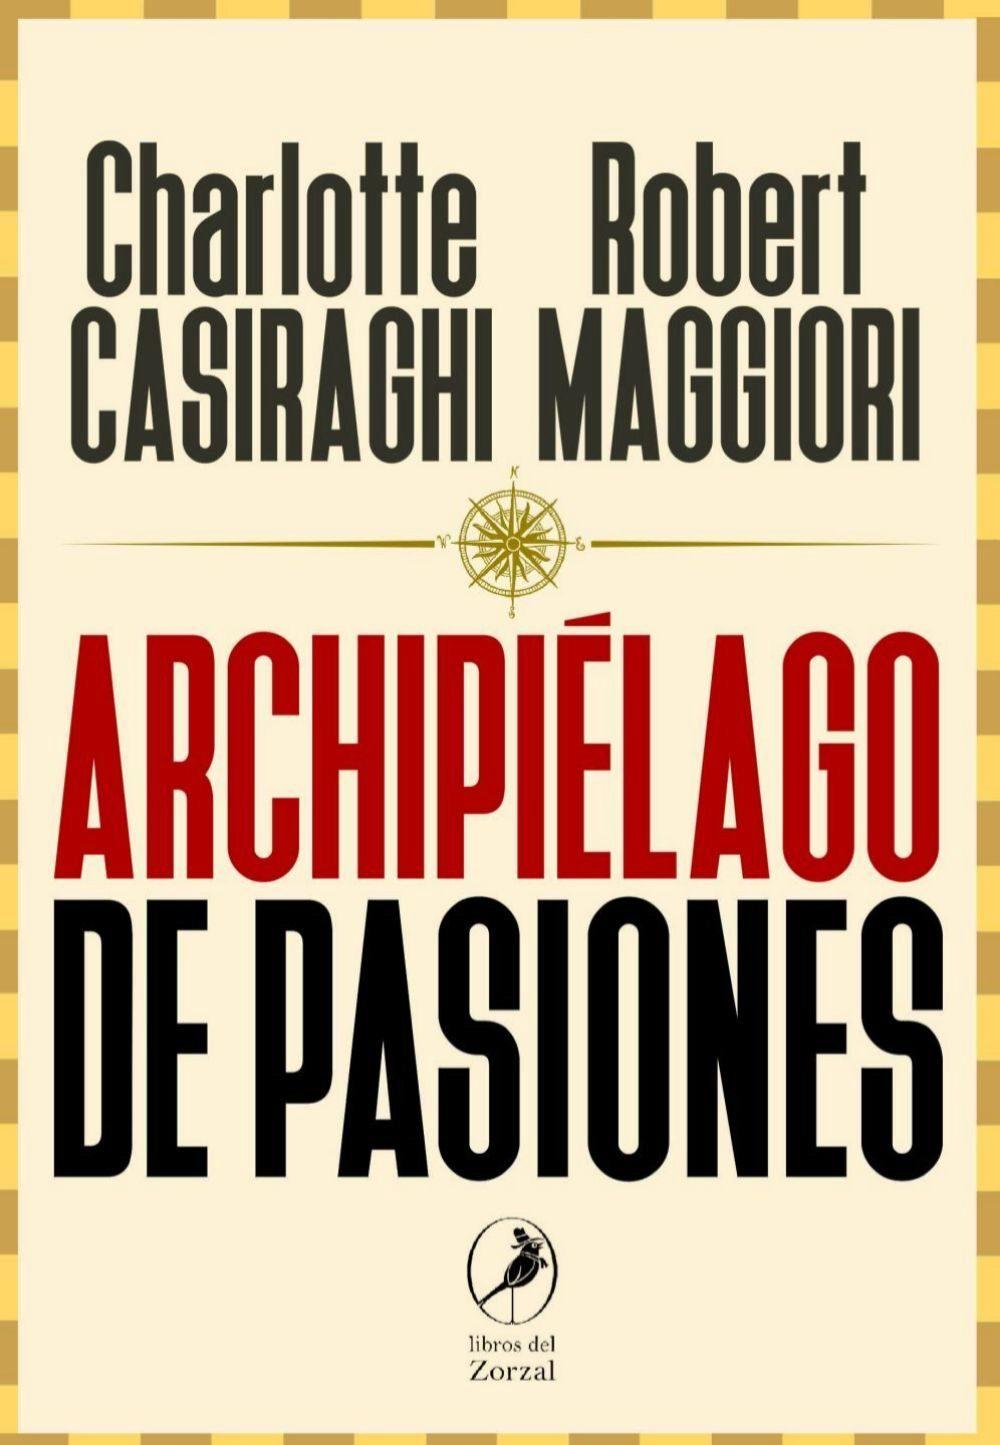 Archipiélago de pasiones, de Carlota Casiraghi y Robert Maggiori.